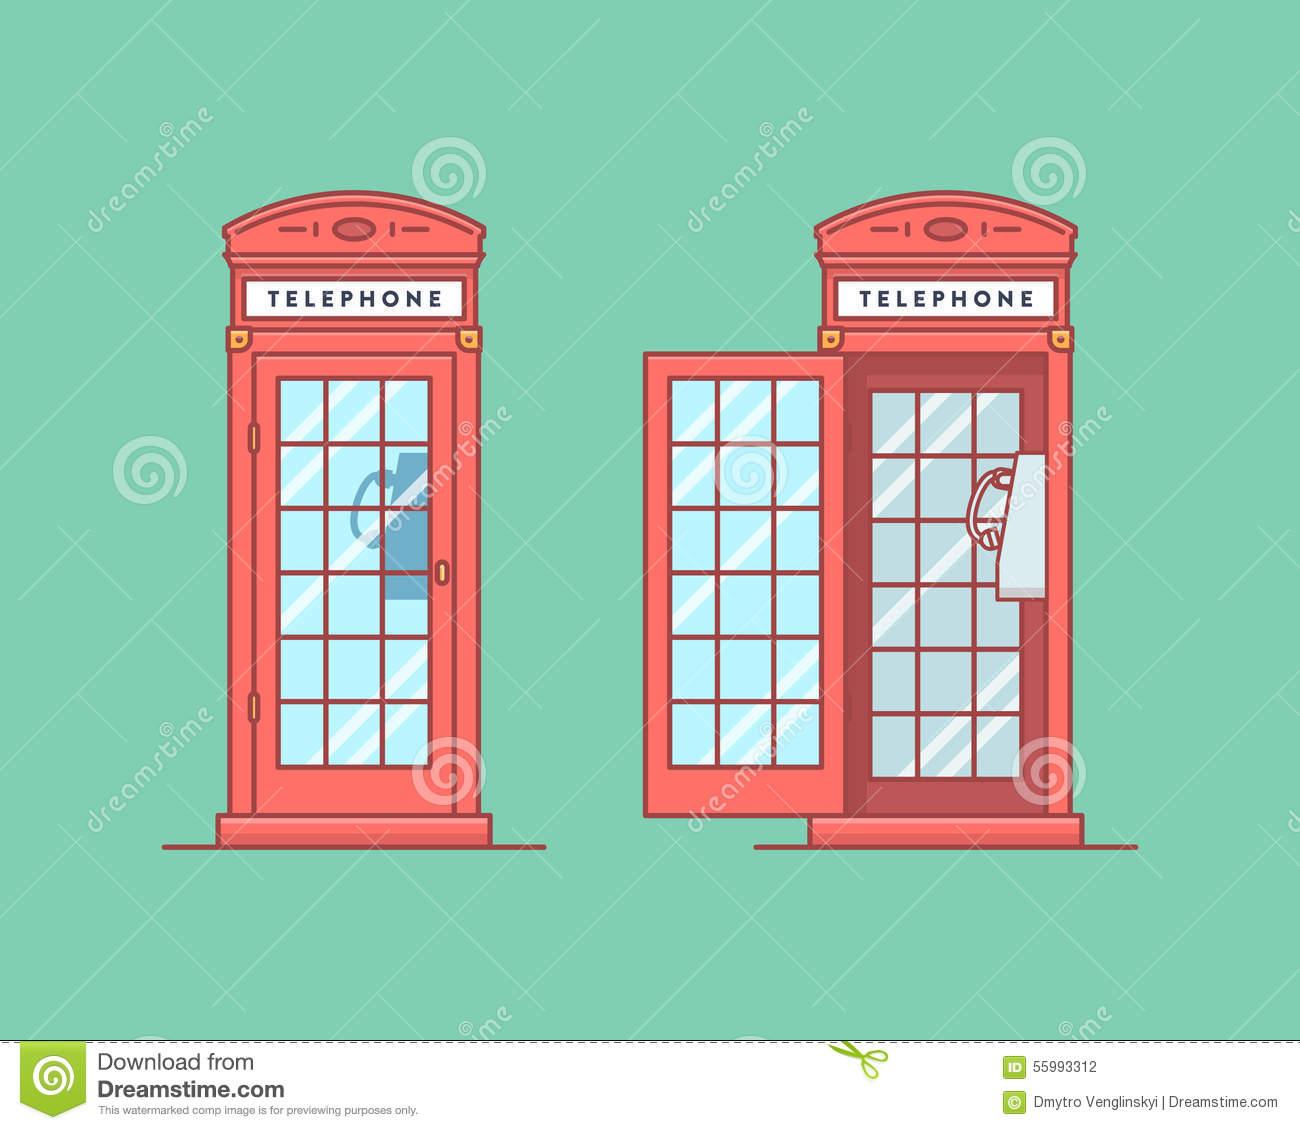 Telephon Stock Illustrations.